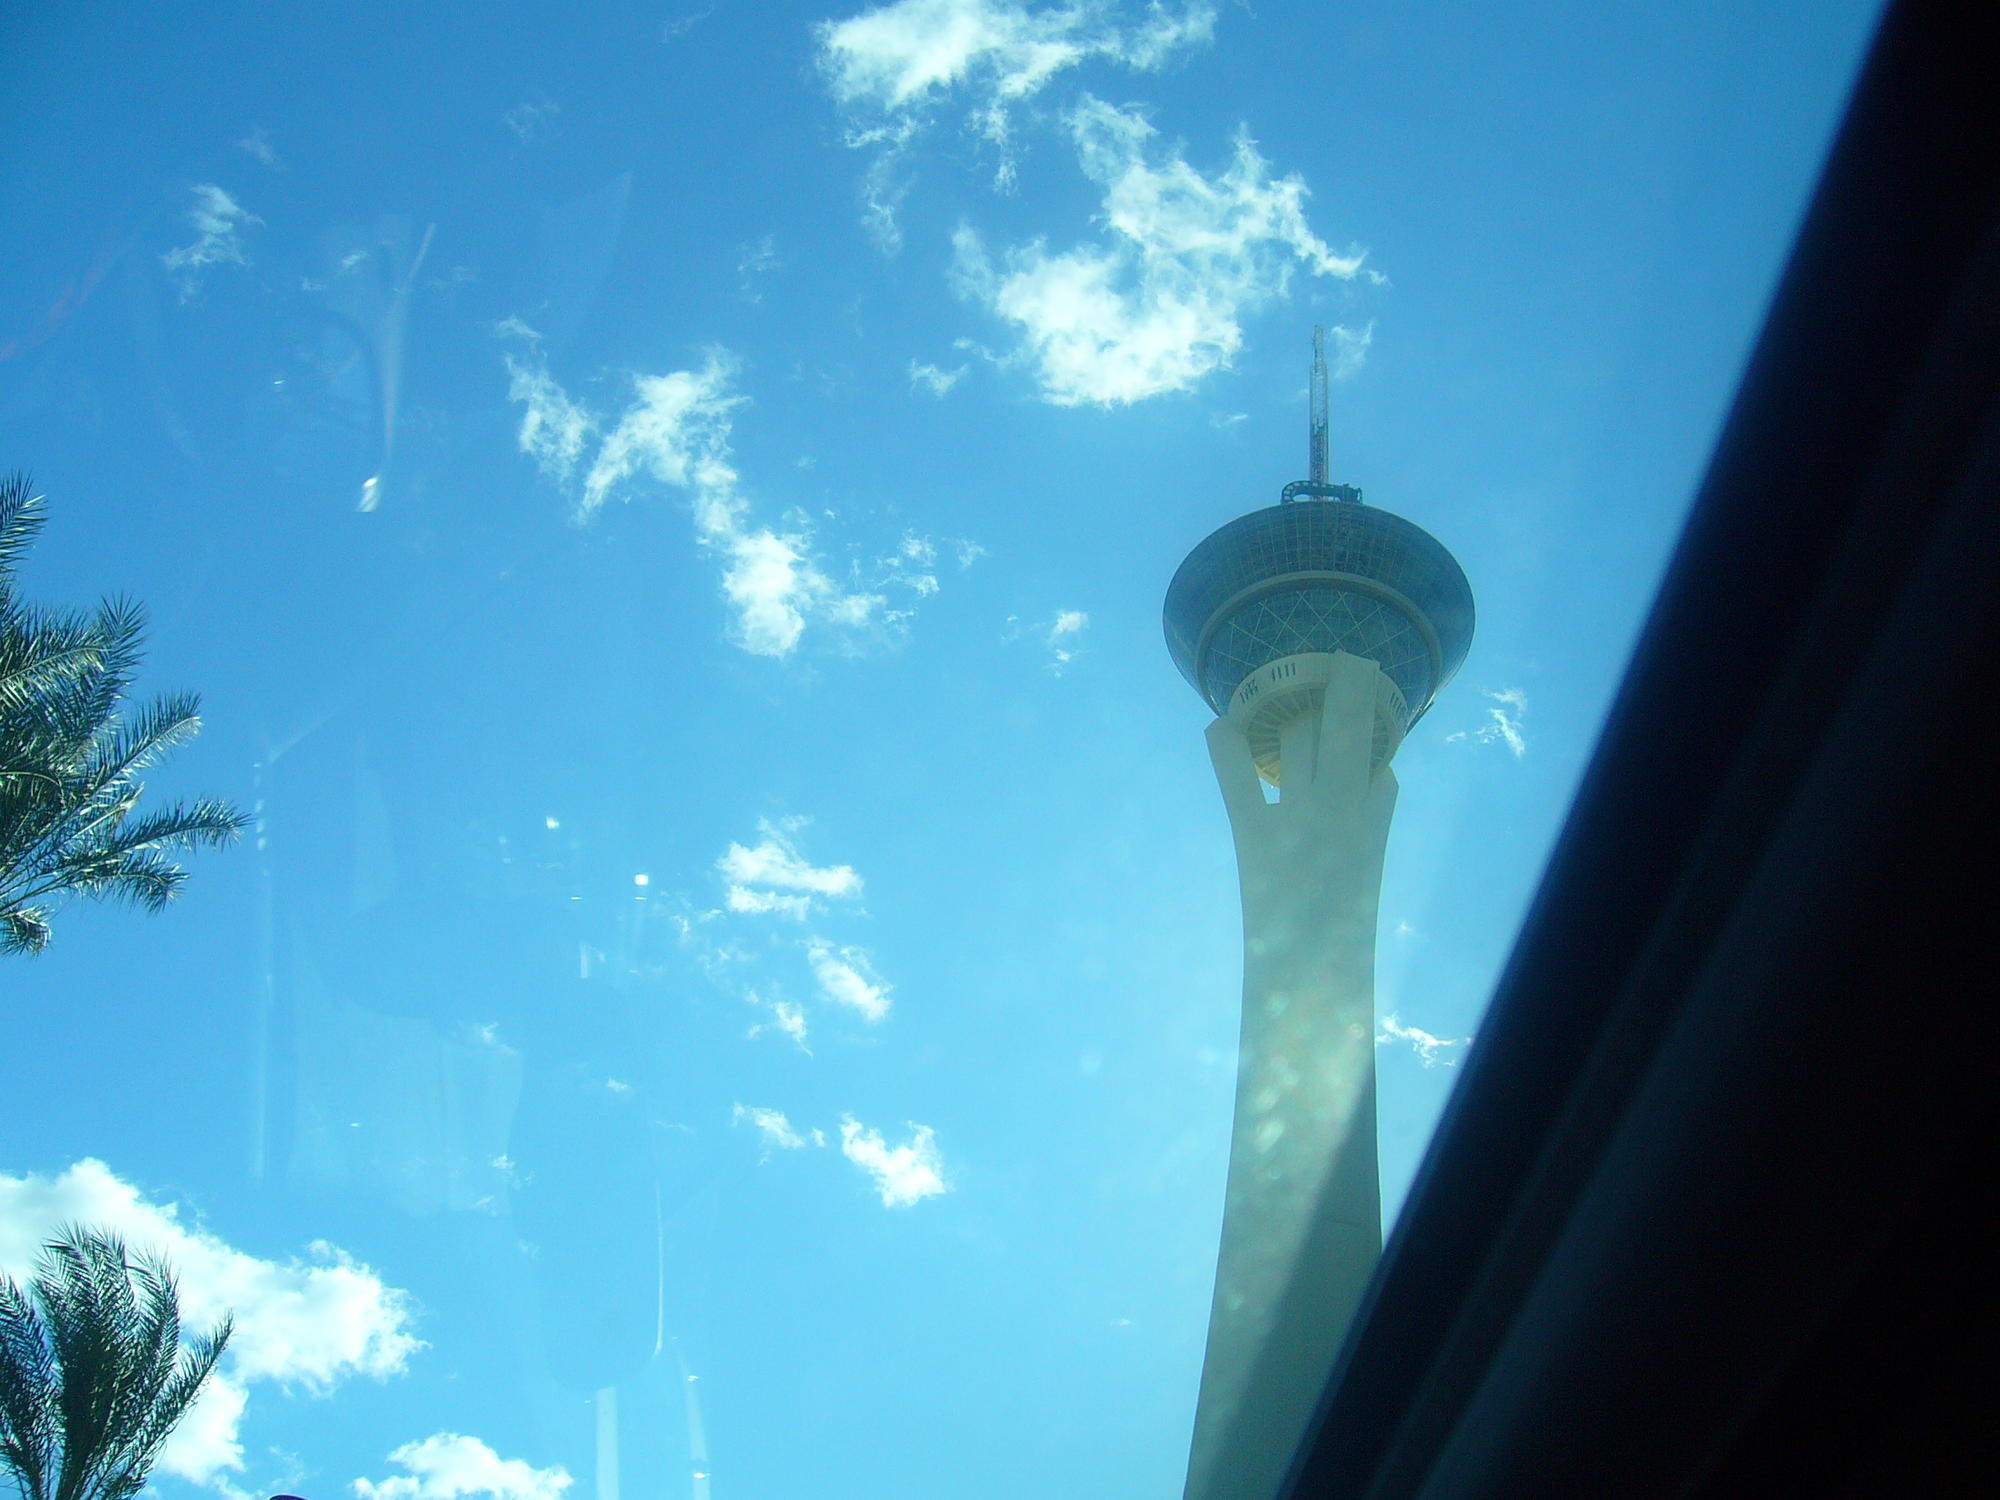 Vegas Pictures (Las Vegas: Restaurants, Prices, Shopping